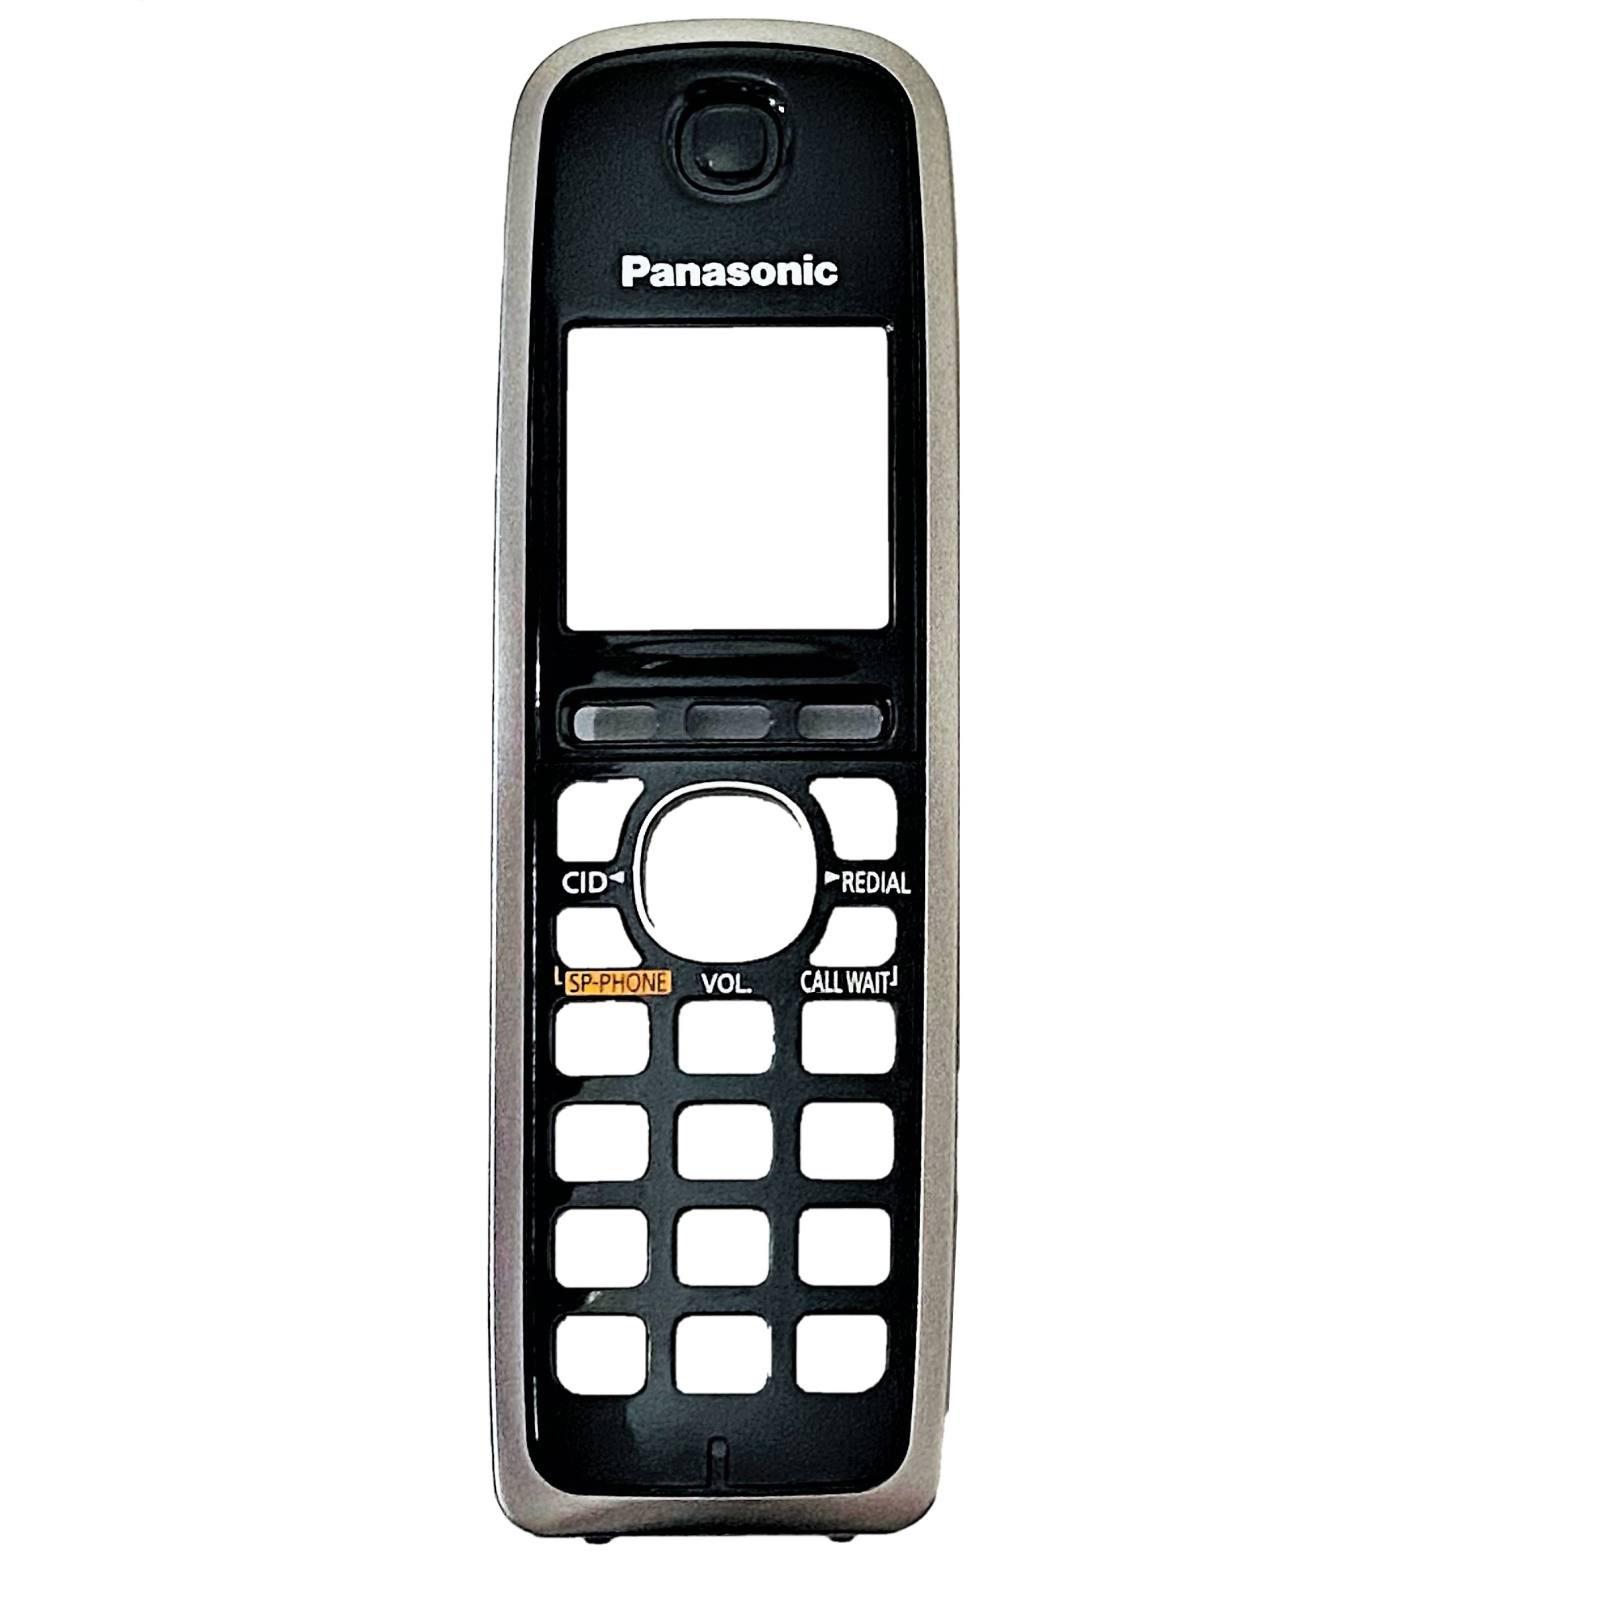 قاب یدکی تلفن بی سیم پاناسونیک مدل 3711-3721